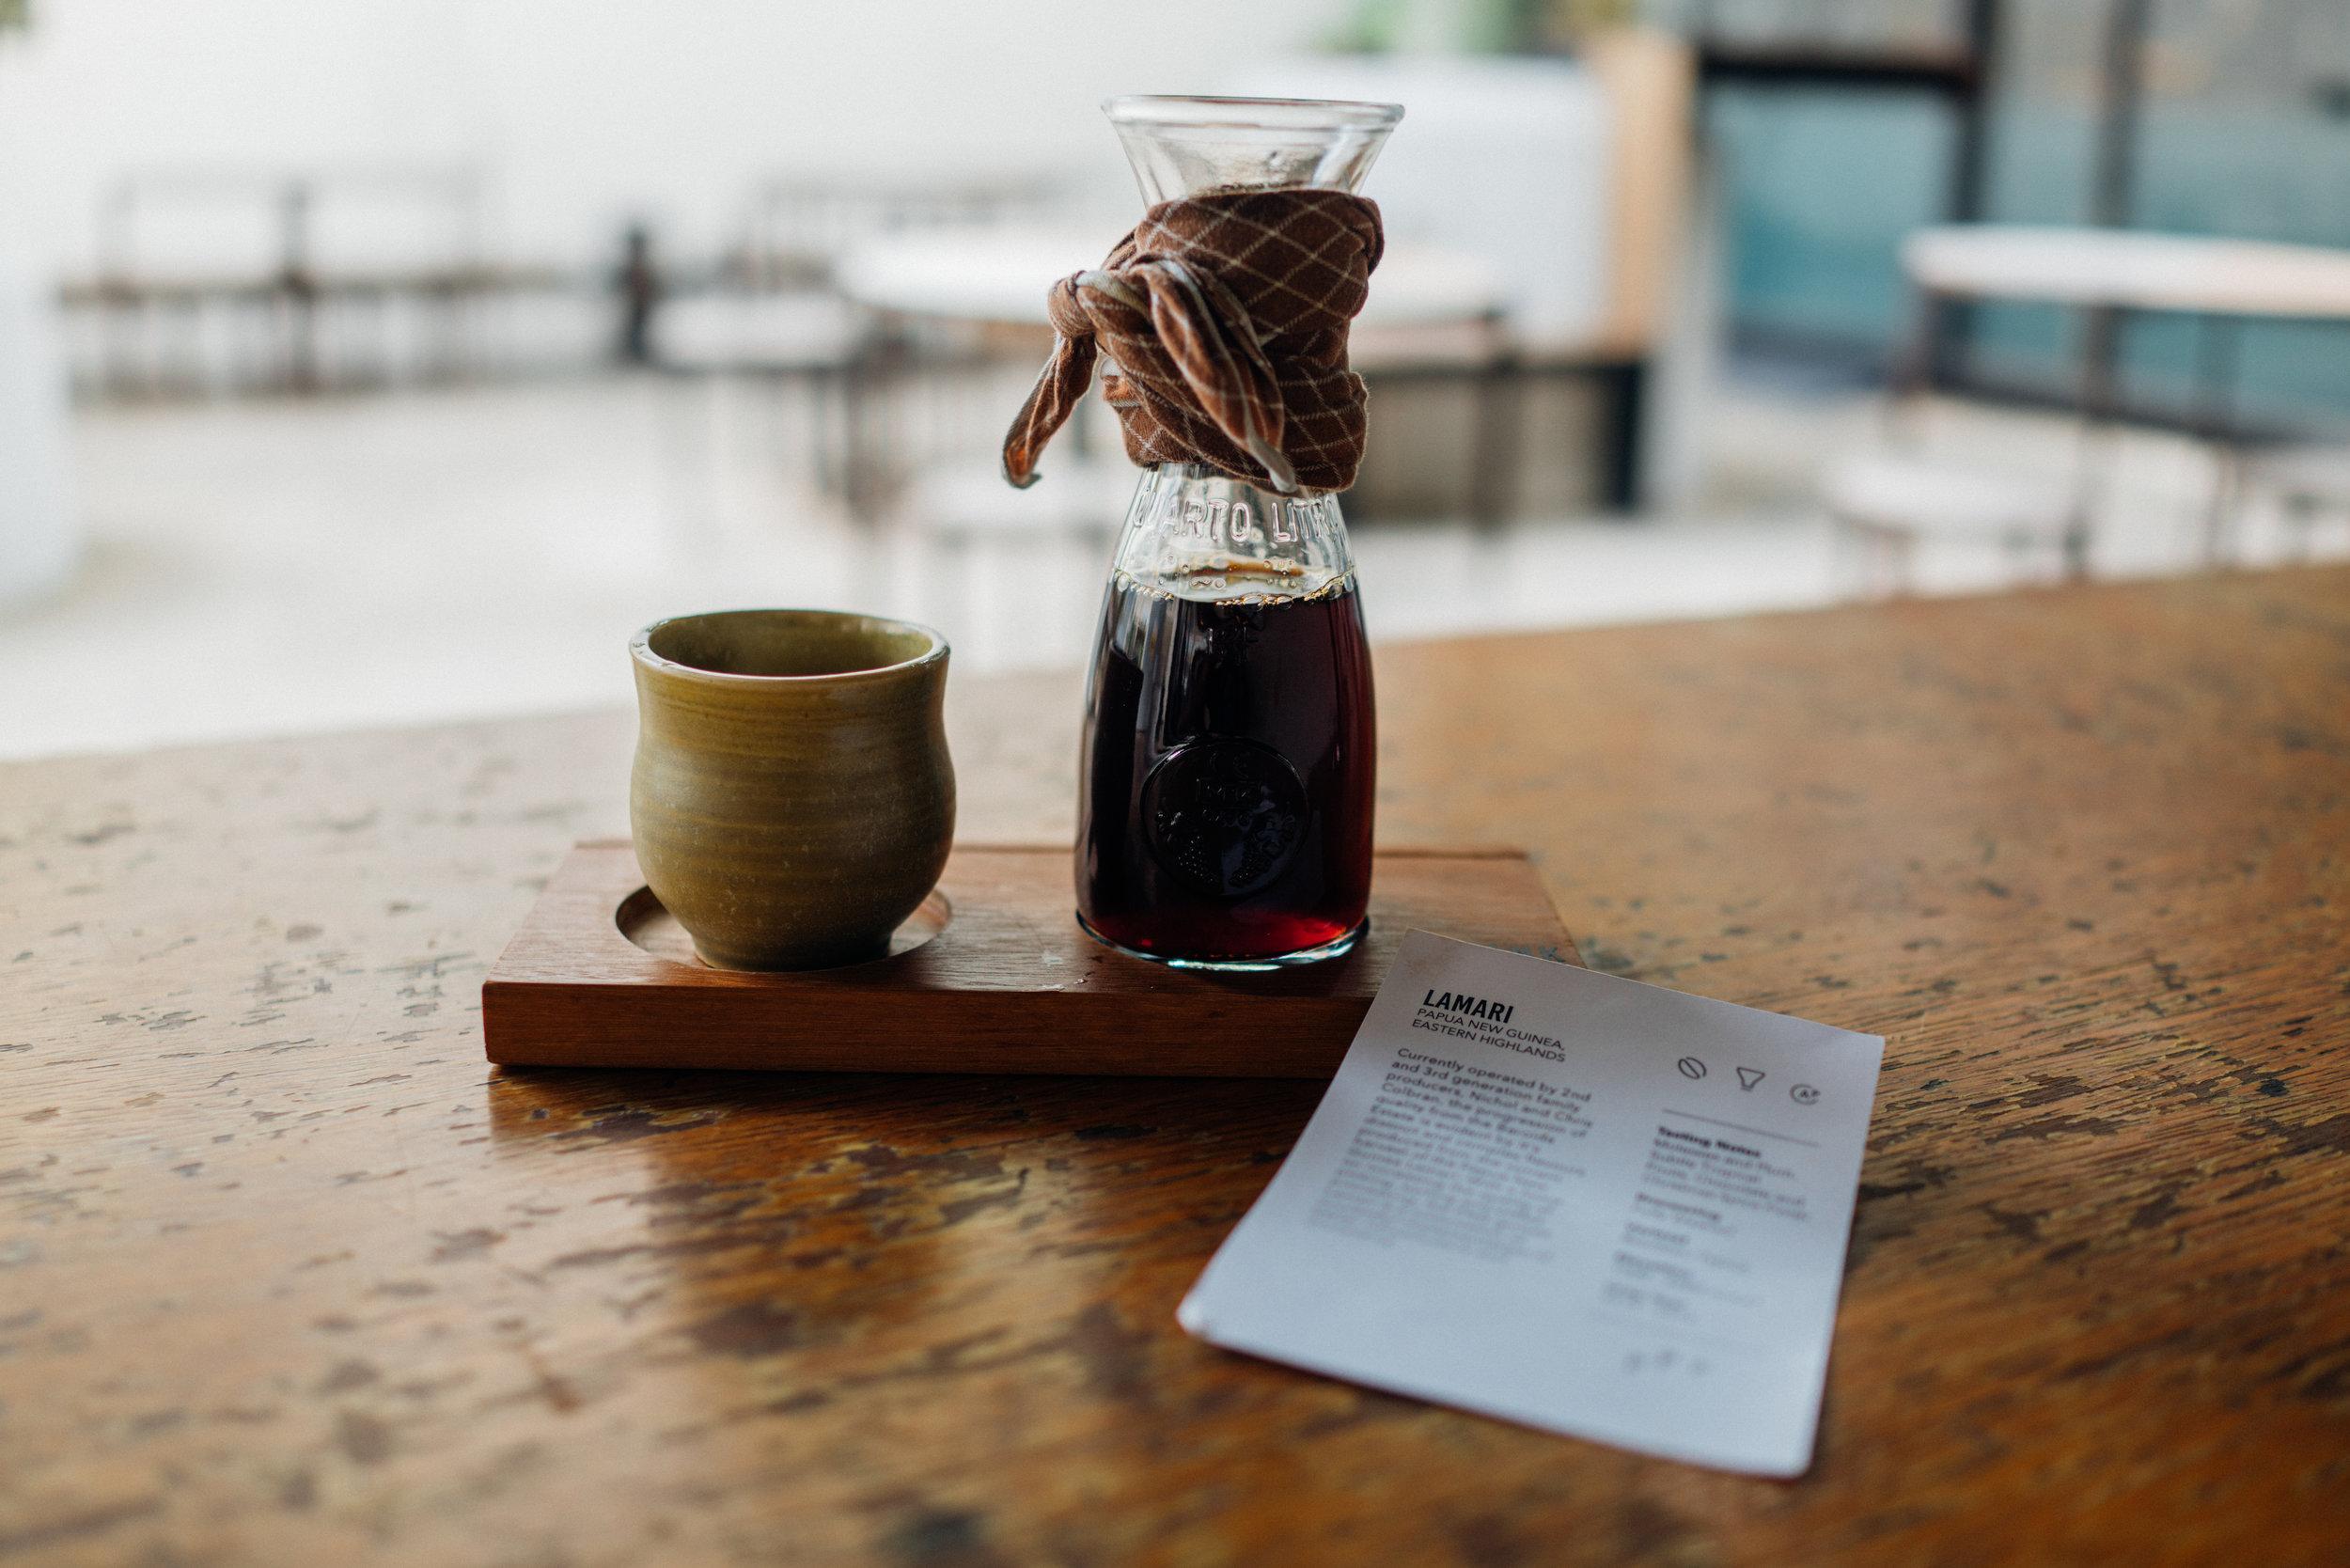 Lamari, a Single Origin Papua New Guinea at Chye Seng Huat Hardware Coffee Bar